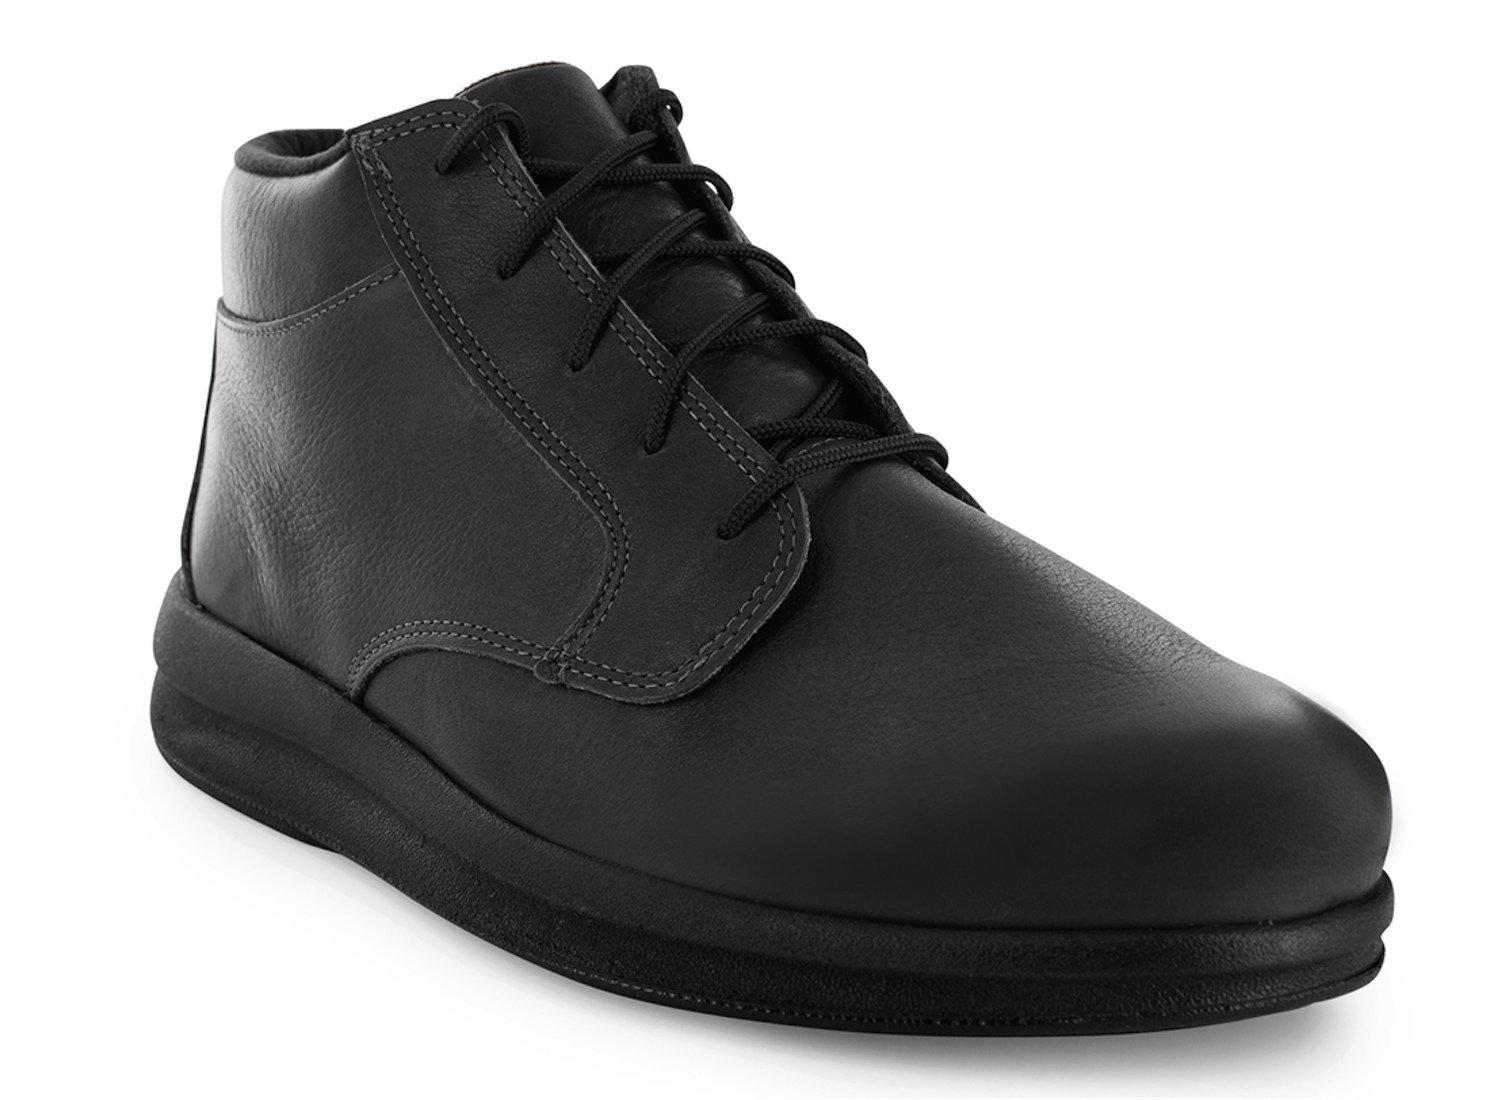 P W Minor Denton DX2 Men's Therapeutic Diabetic Extra Depth Shoe: Black 12.5 Wide (E) Lace by P.W. Minor